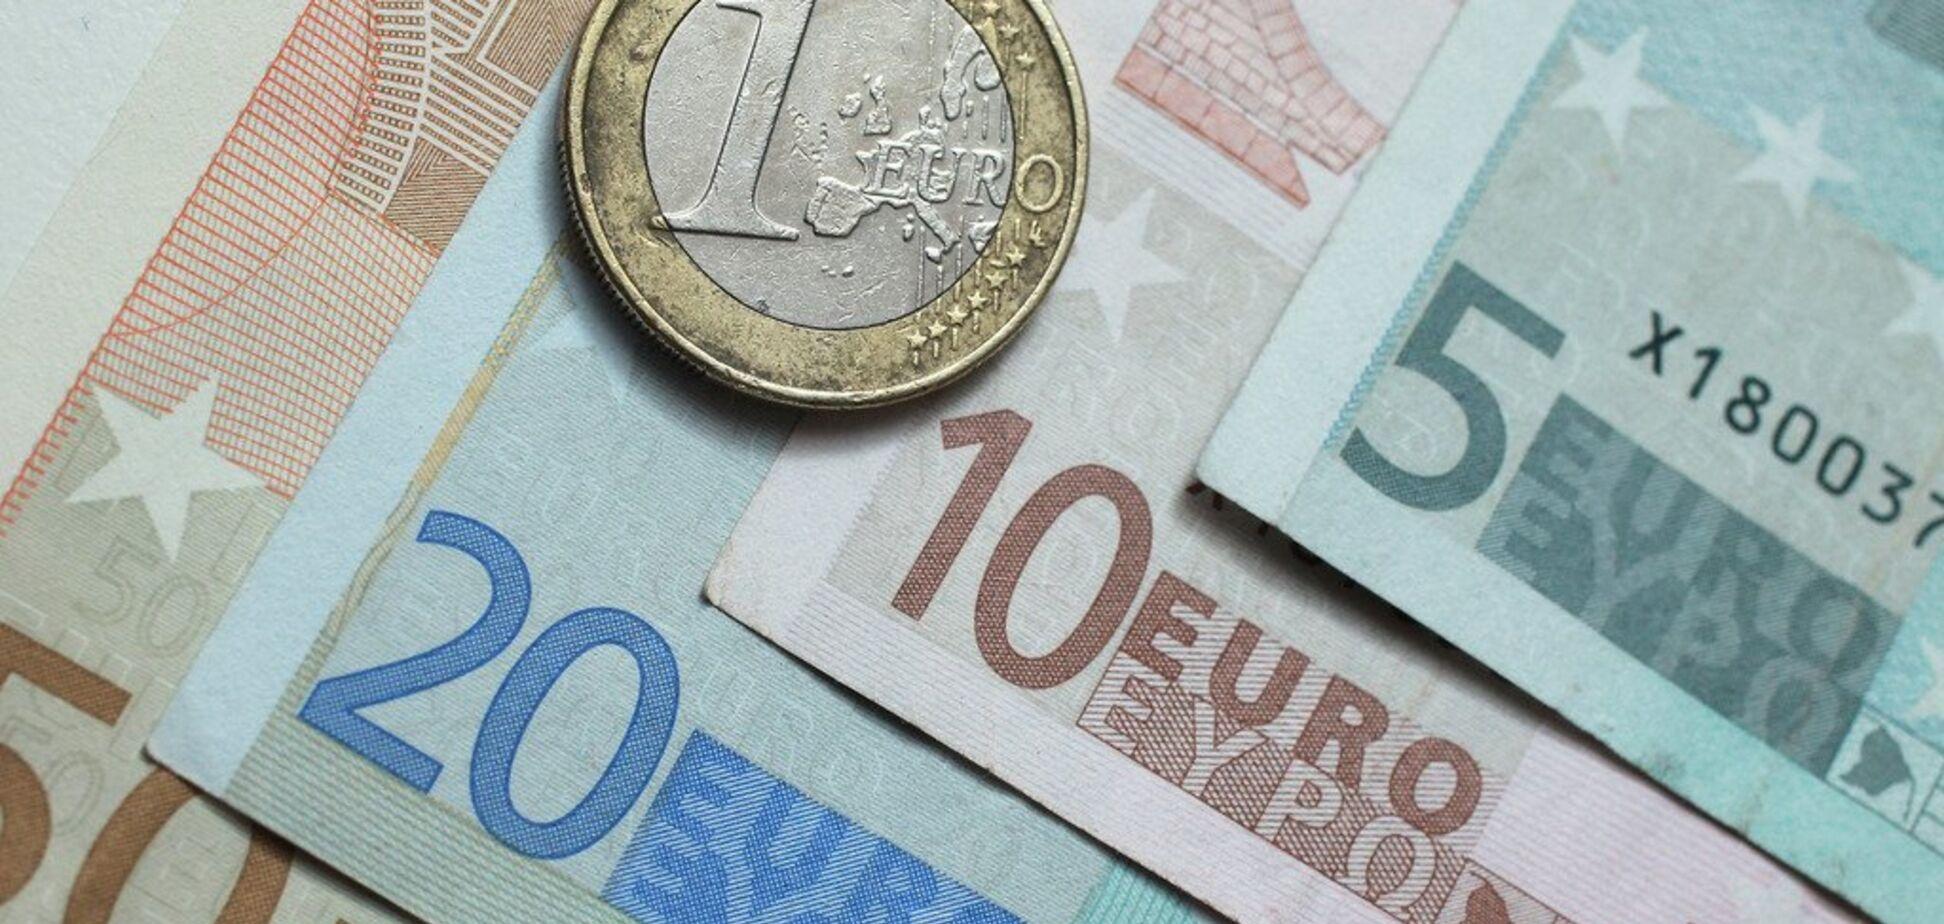 Евро в банках существенно подорожал: опубликован свежий курс валют